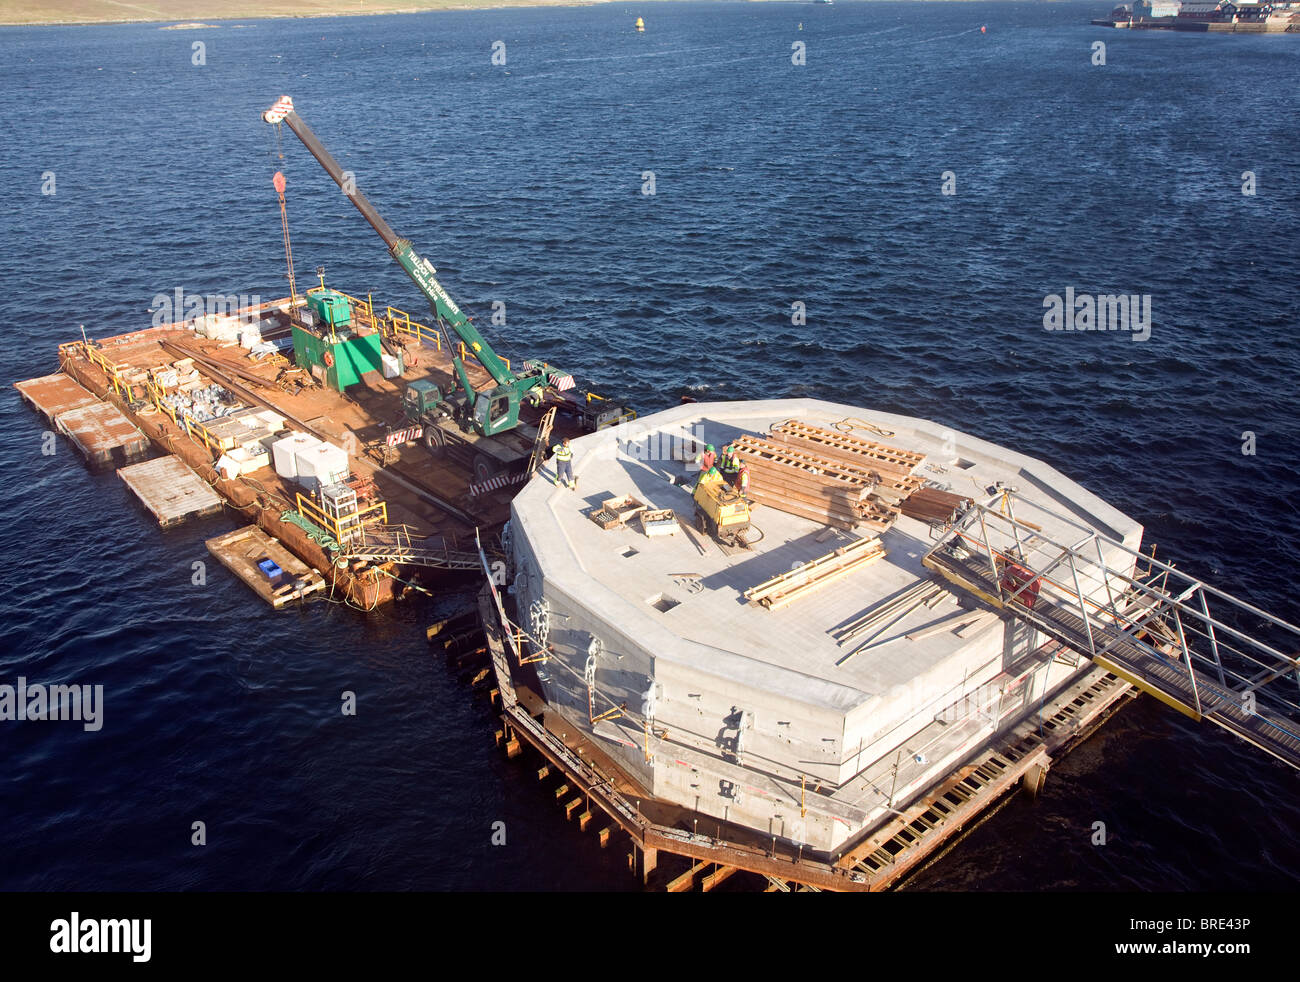 Construction work, Lerwick harbour, Shetland Islands, Scotland - Stock Image